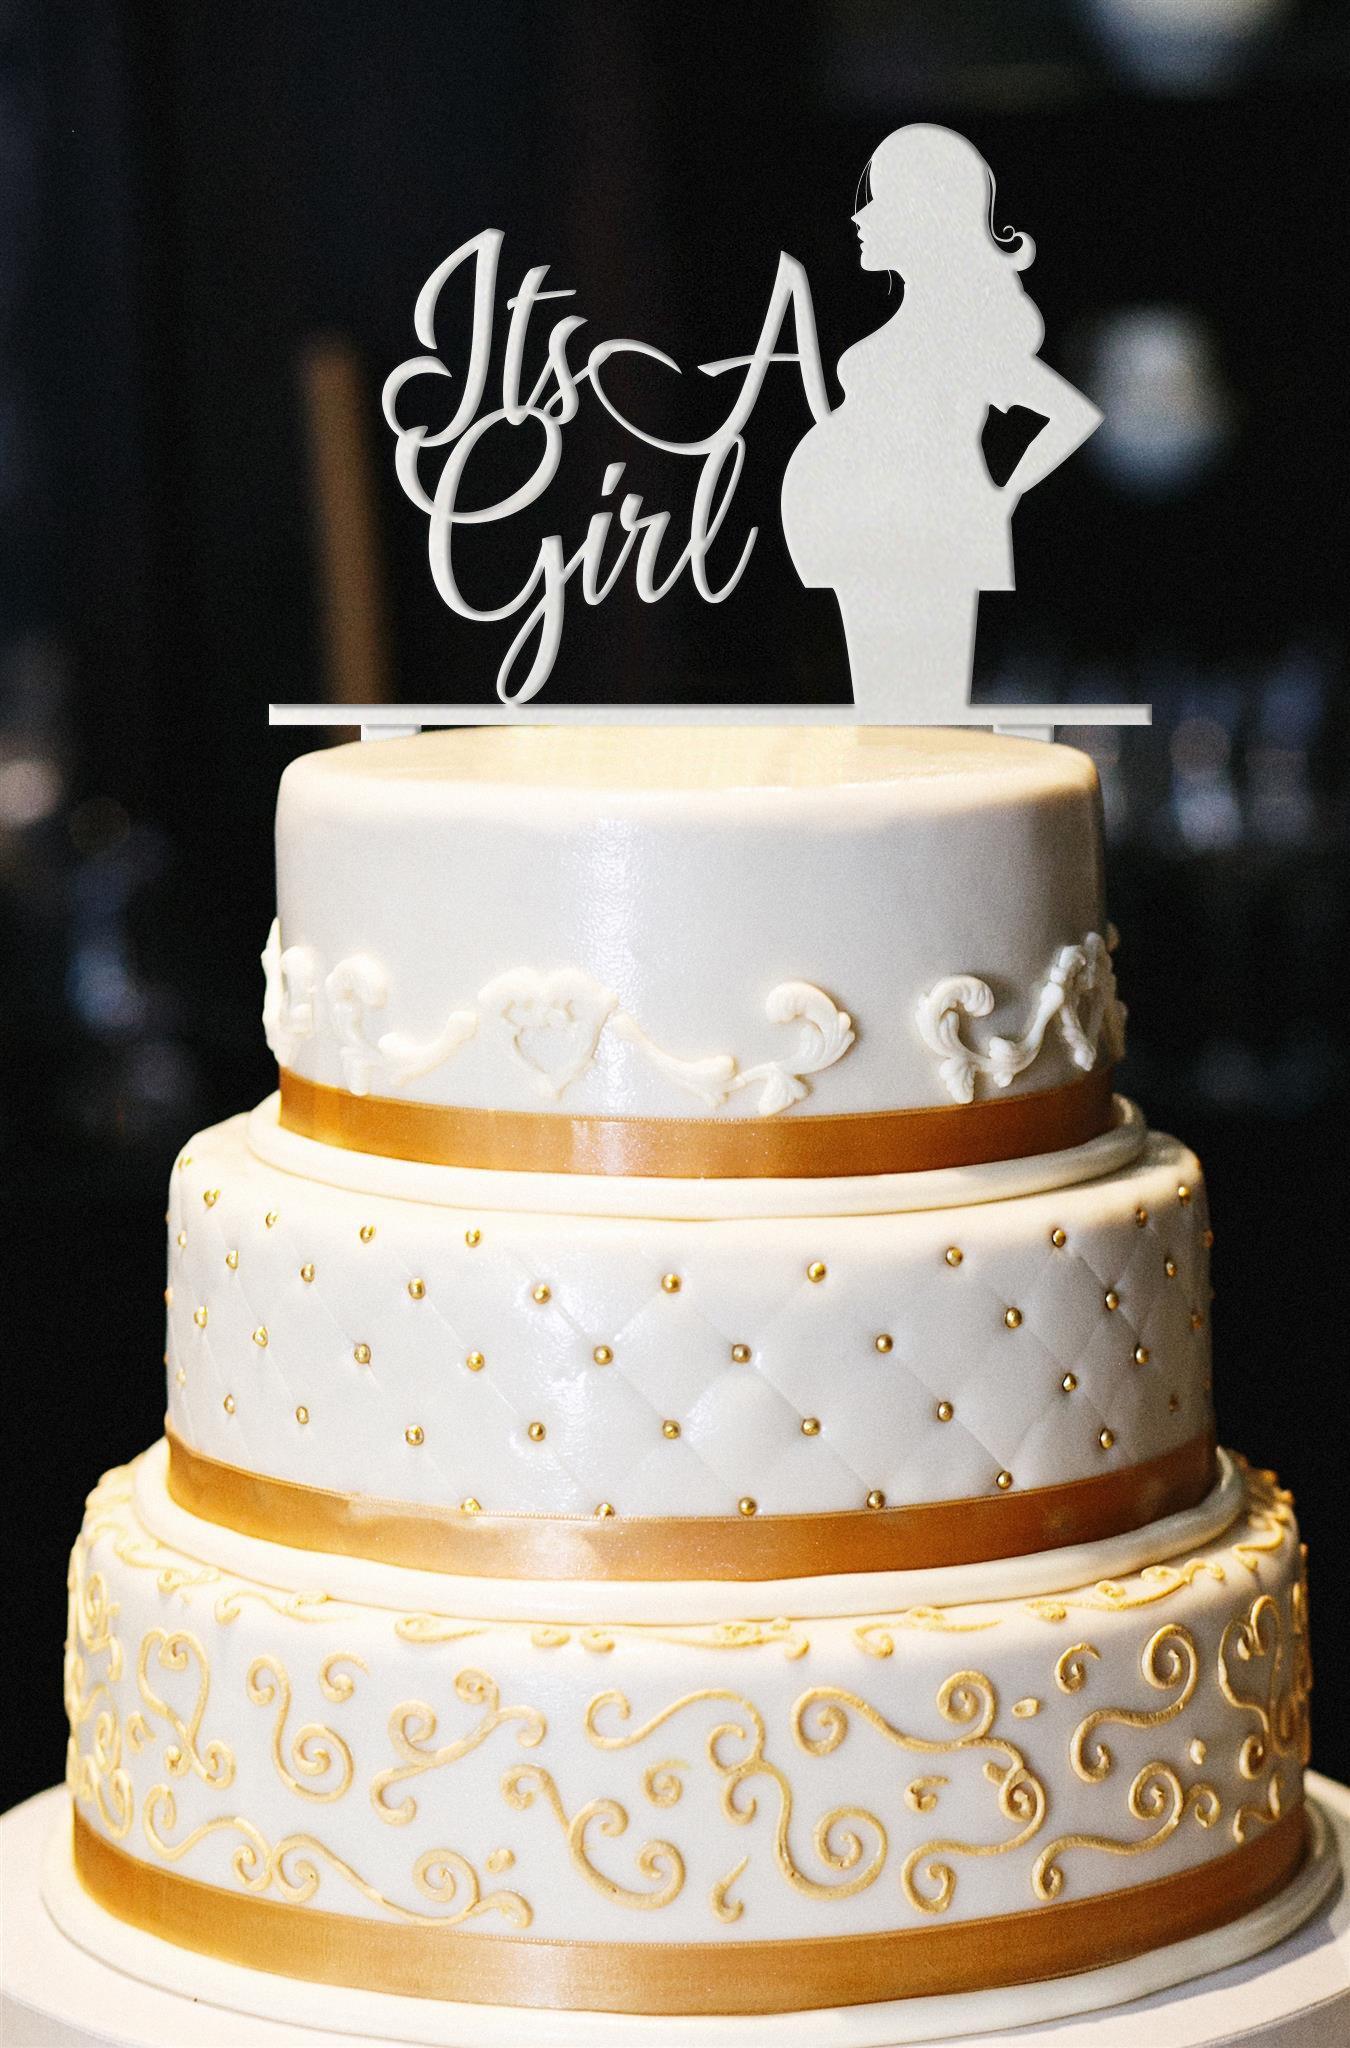 It's A Girl Cake Topper, Baby Bump Cake Topper, Glitter Baby Shower Cake Topper, Glitter Gender Reveal Cake Topper, Glitter Baby Shower (13'', Pearl White)